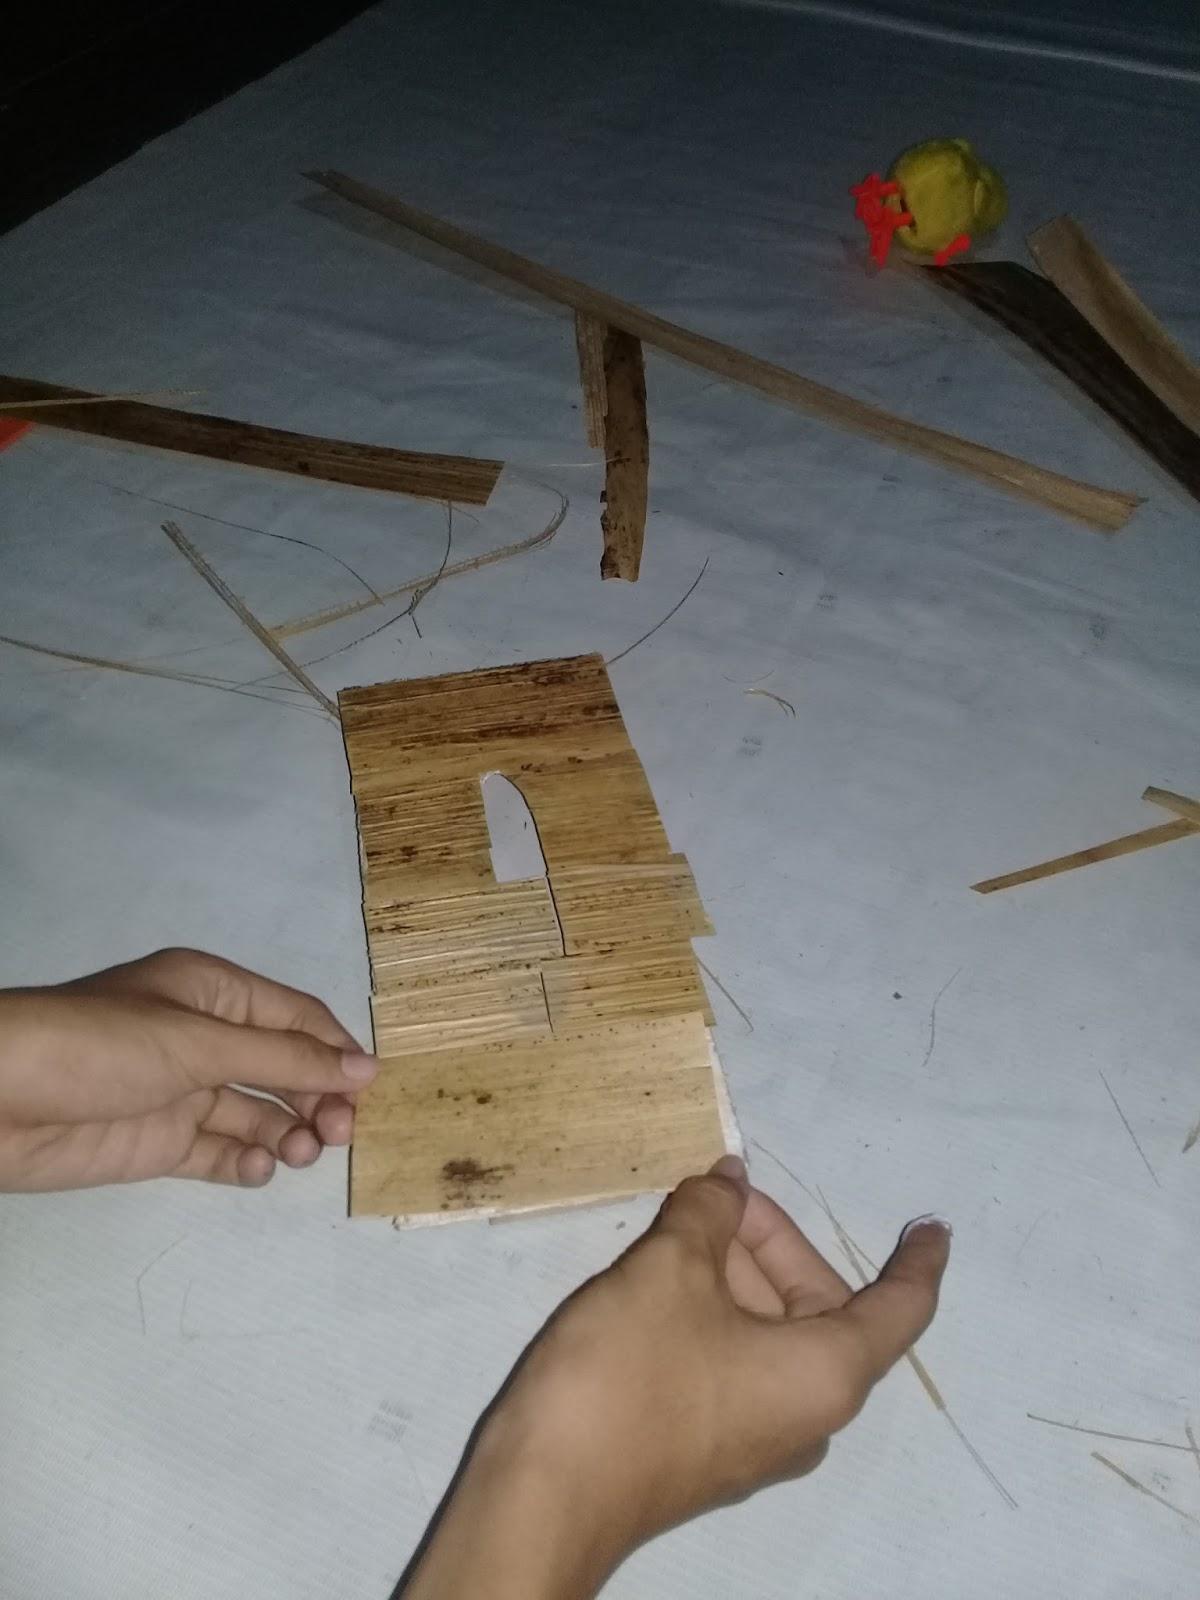 Kotak Tisu Dari Pelepah Pisang : kotak, pelepah, pisang, Agung, Kotak, Pelapah, Pisang, Pembuatannya